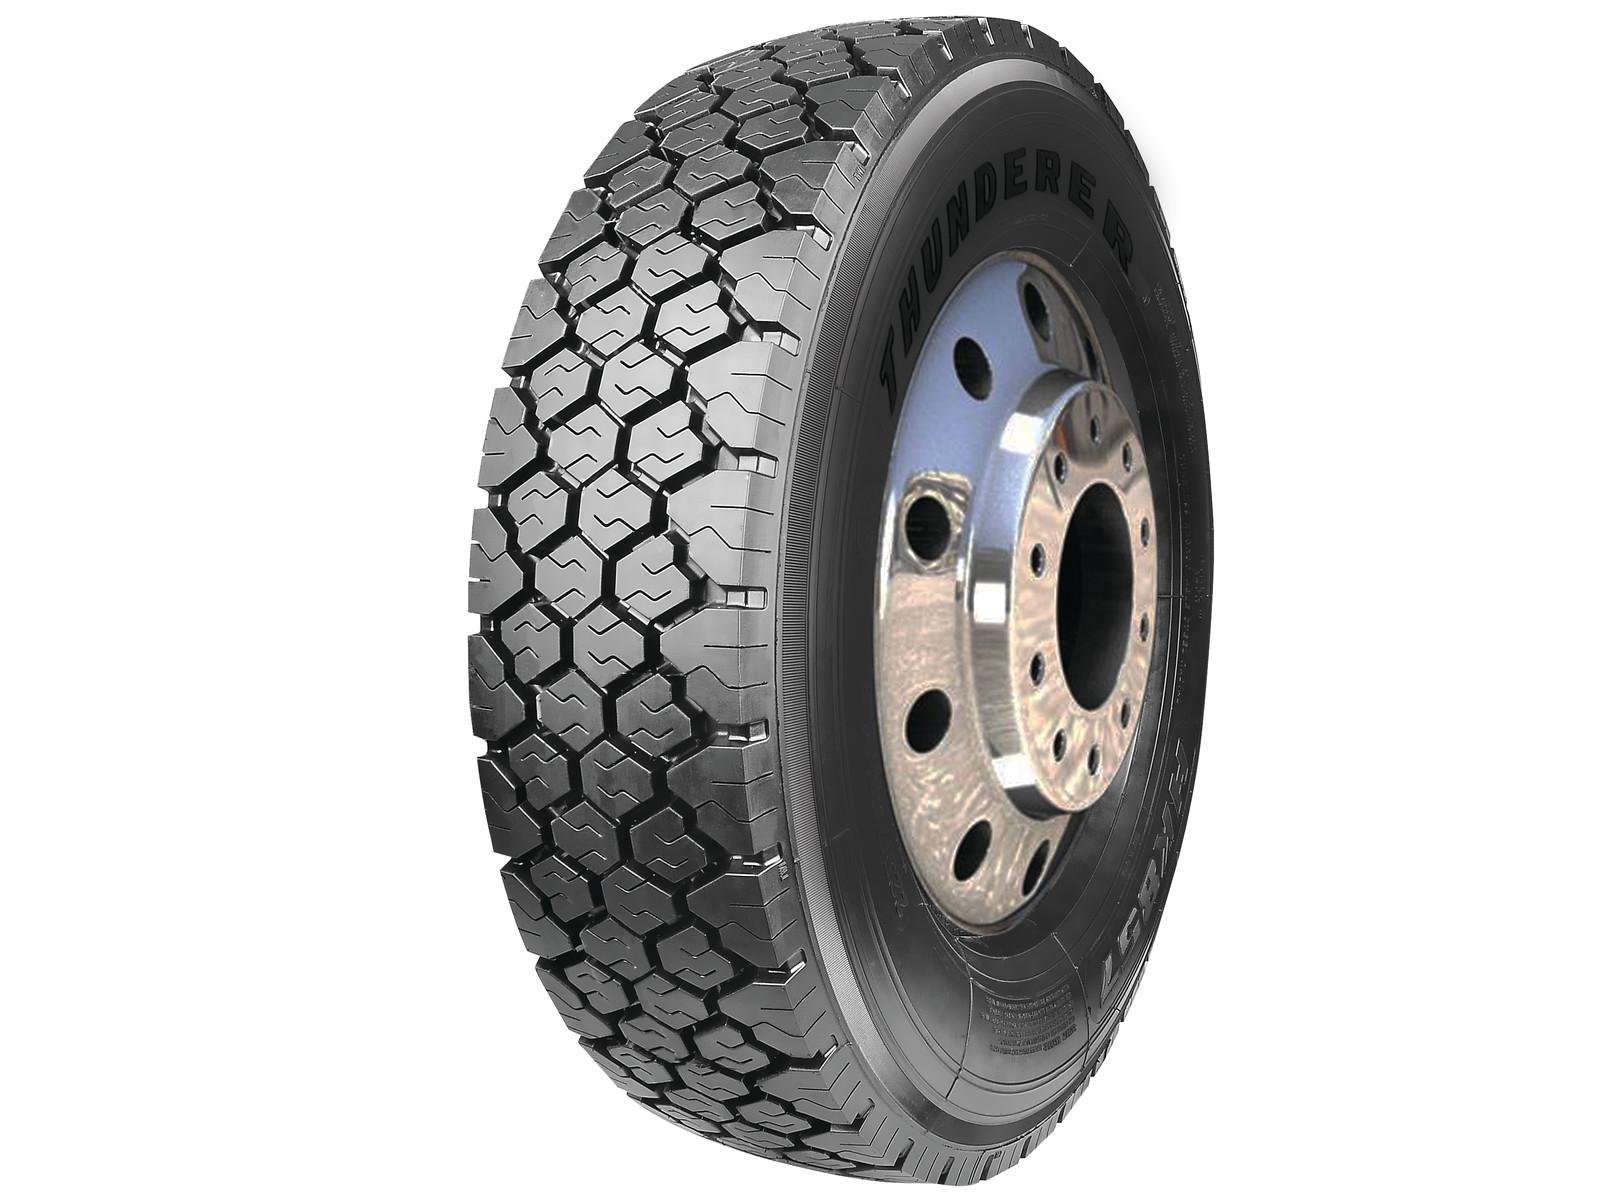 Don S Tire Abilene Ks Don S Tire Supply Quality Tire Sales and Abilene Kansas